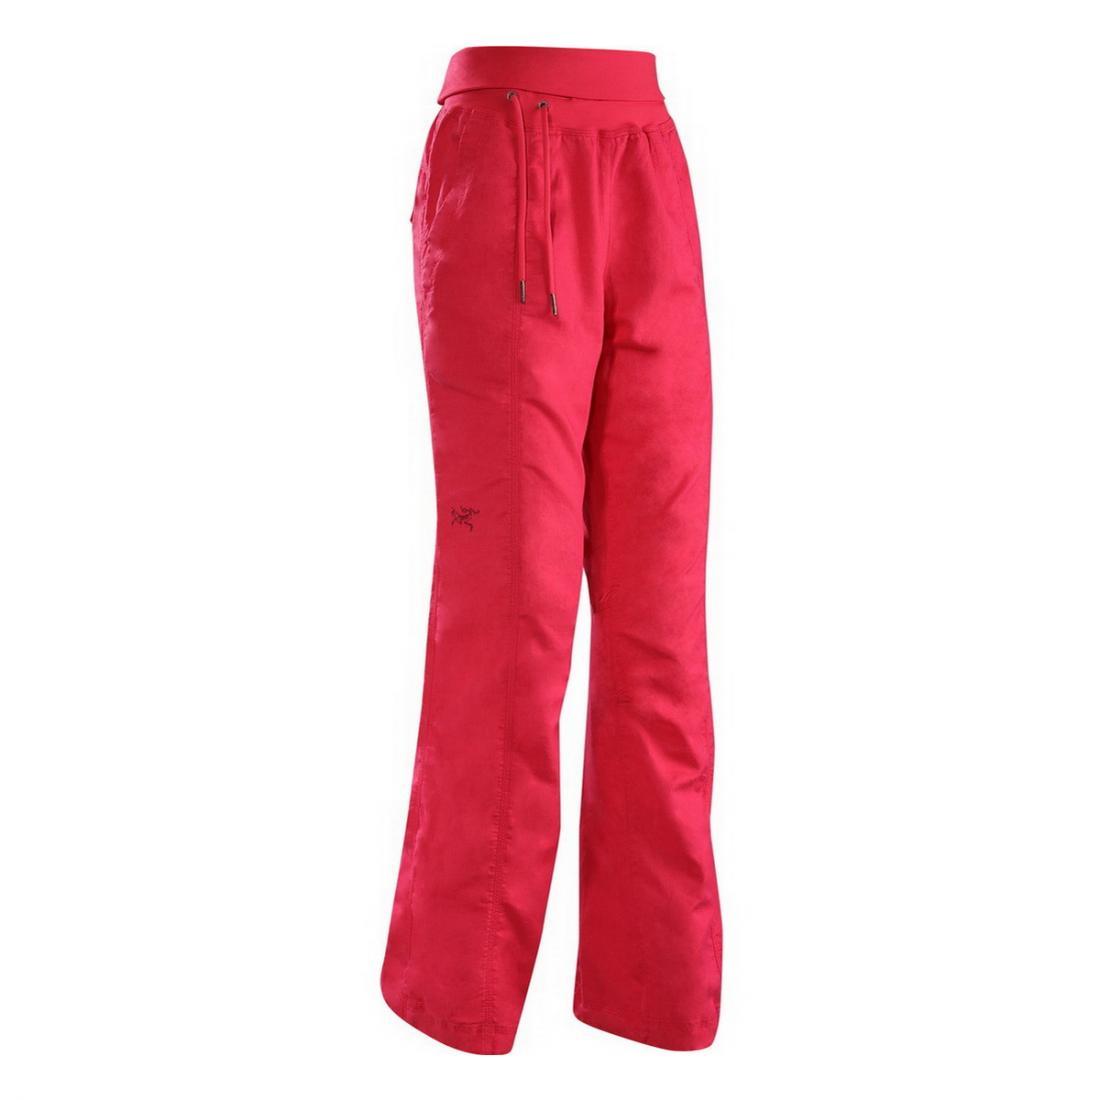 Брюки Roxen Pant жен.Брюки, штаны<br><br><br>Цвет: Розовый<br>Размер: 10